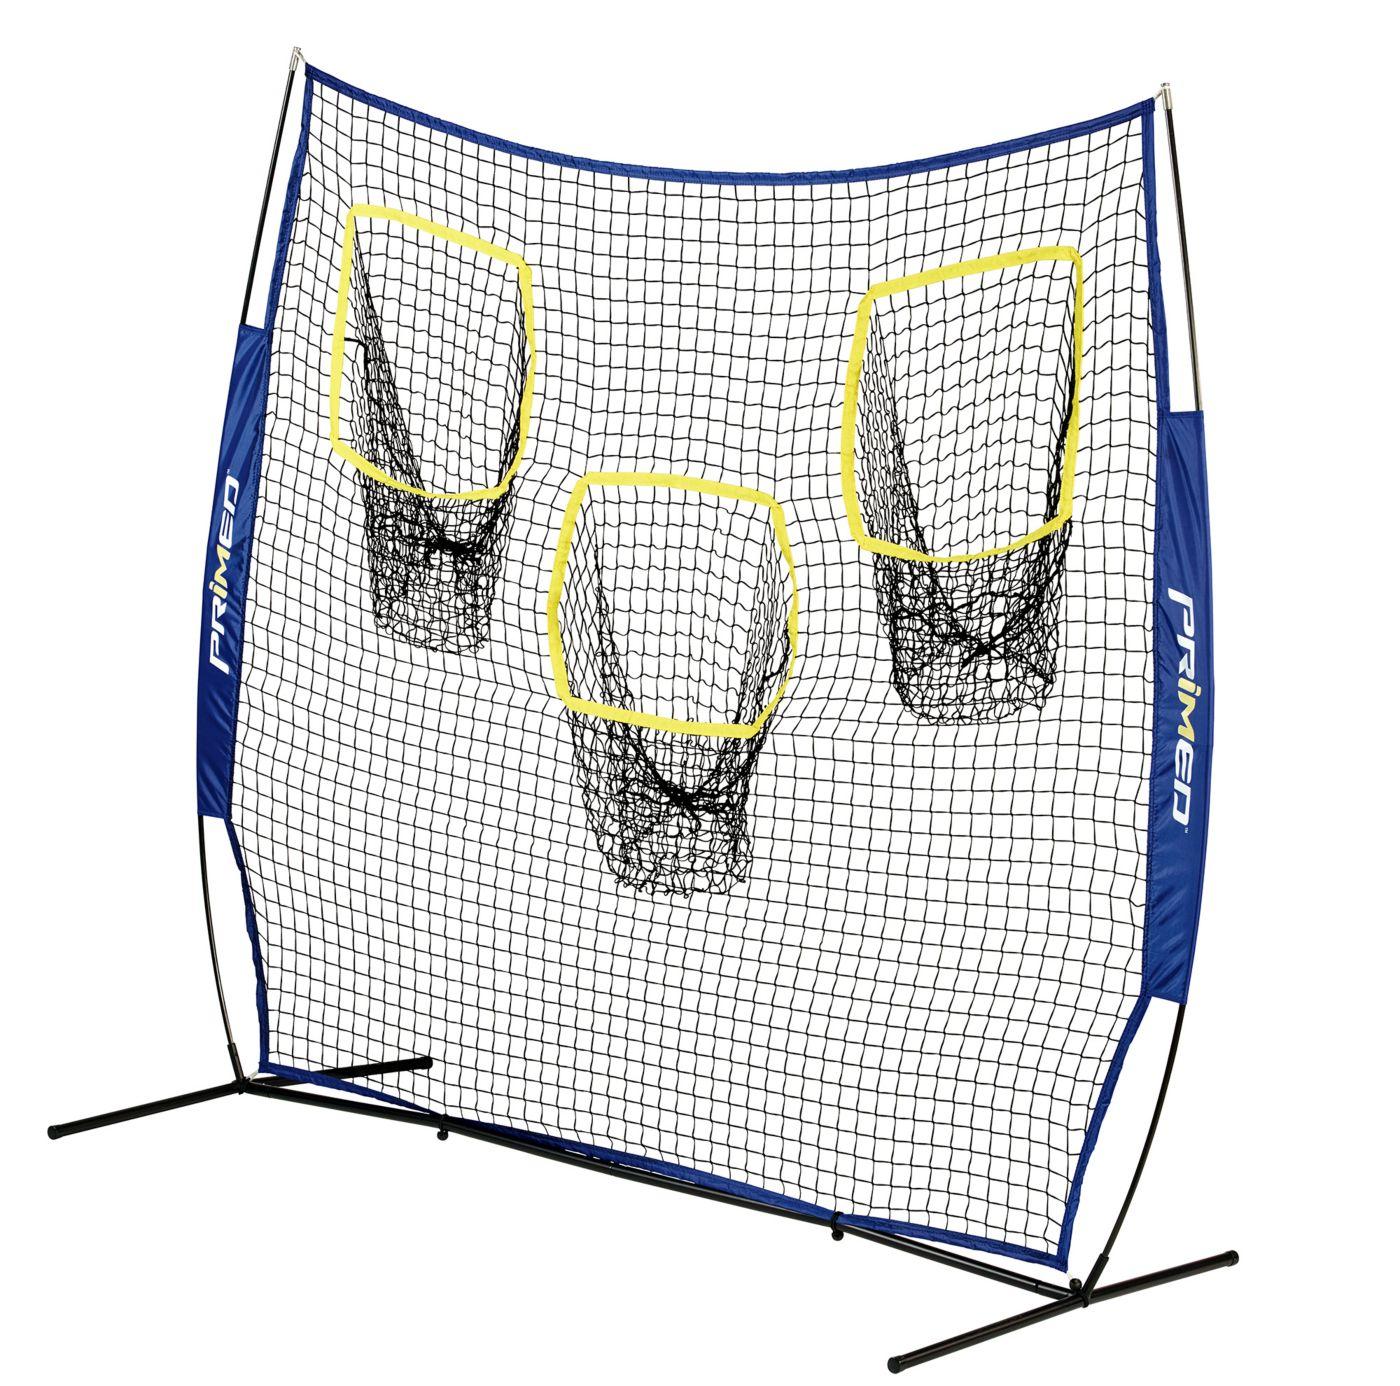 Primed 7' Portable Quarterback Instant Net